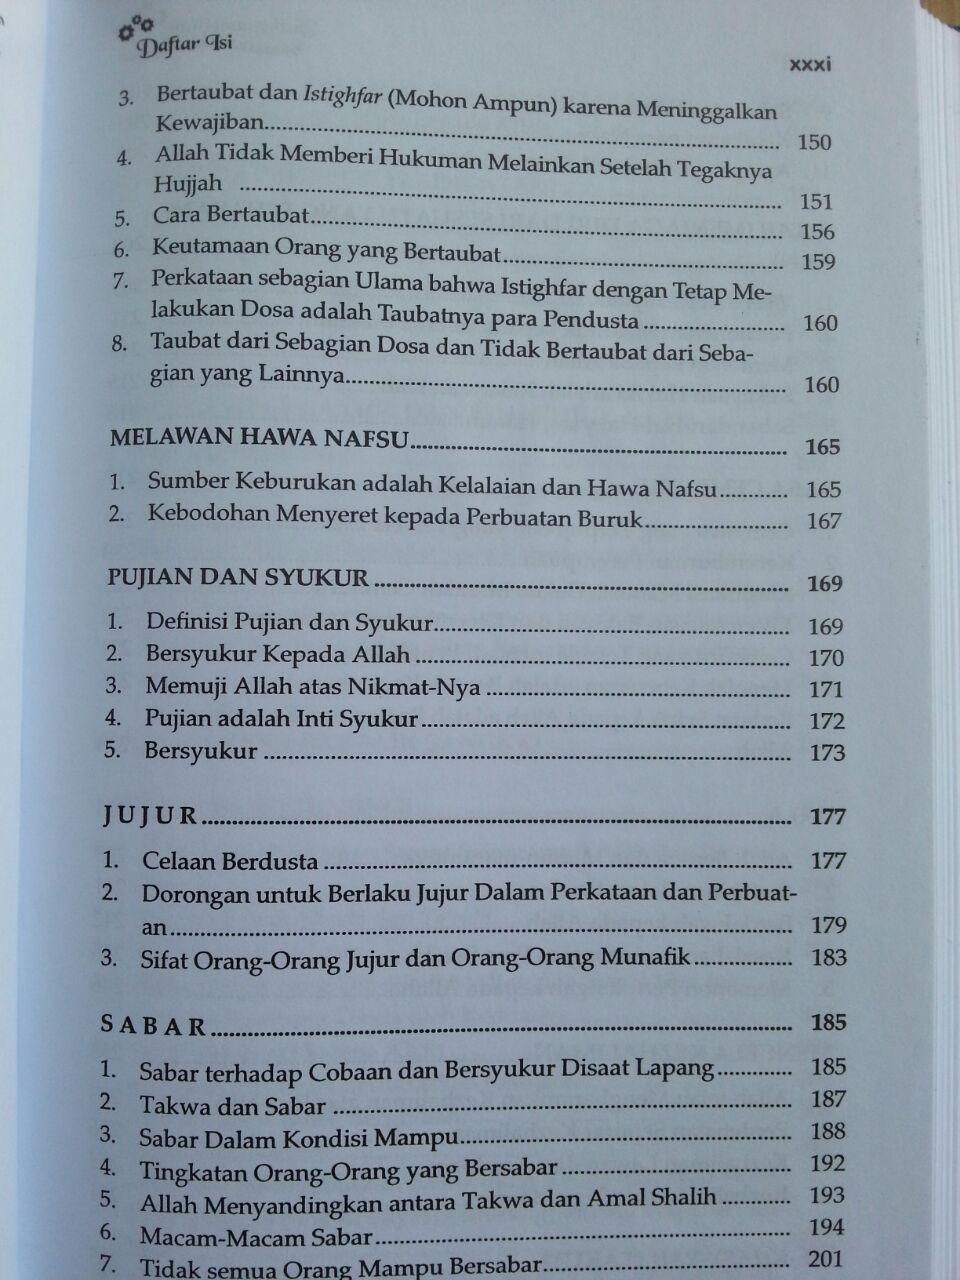 Buku Tazkiyatun Nafs isi